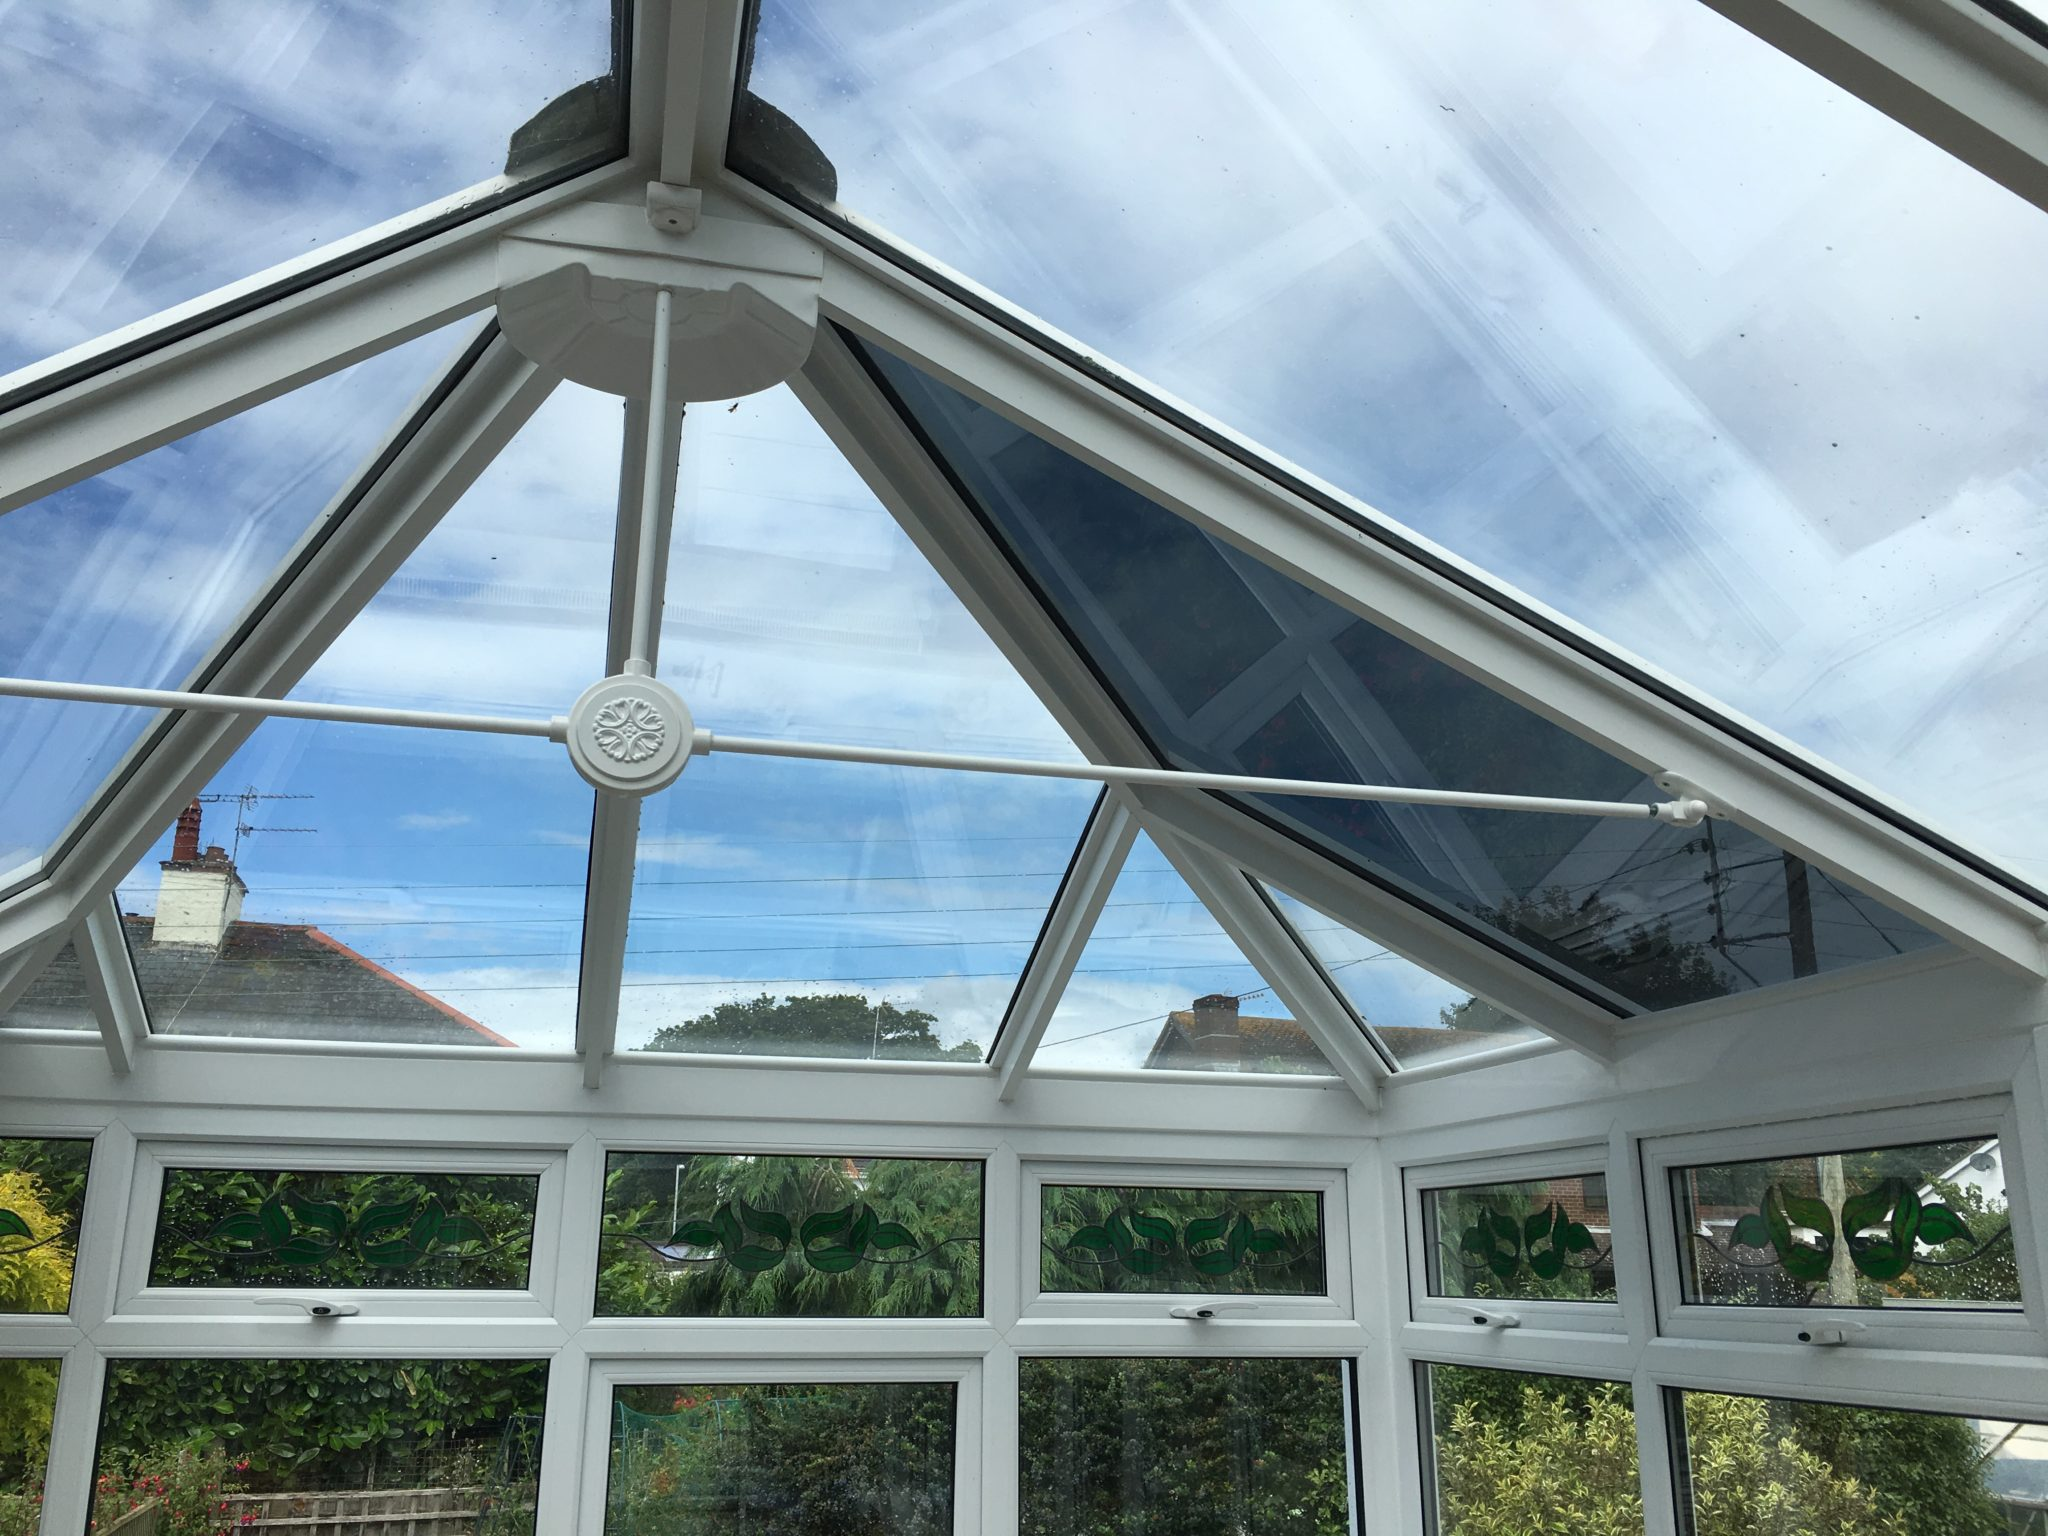 Conservatory Glare Reduction Solar Heat Gain Coefficient 0.28